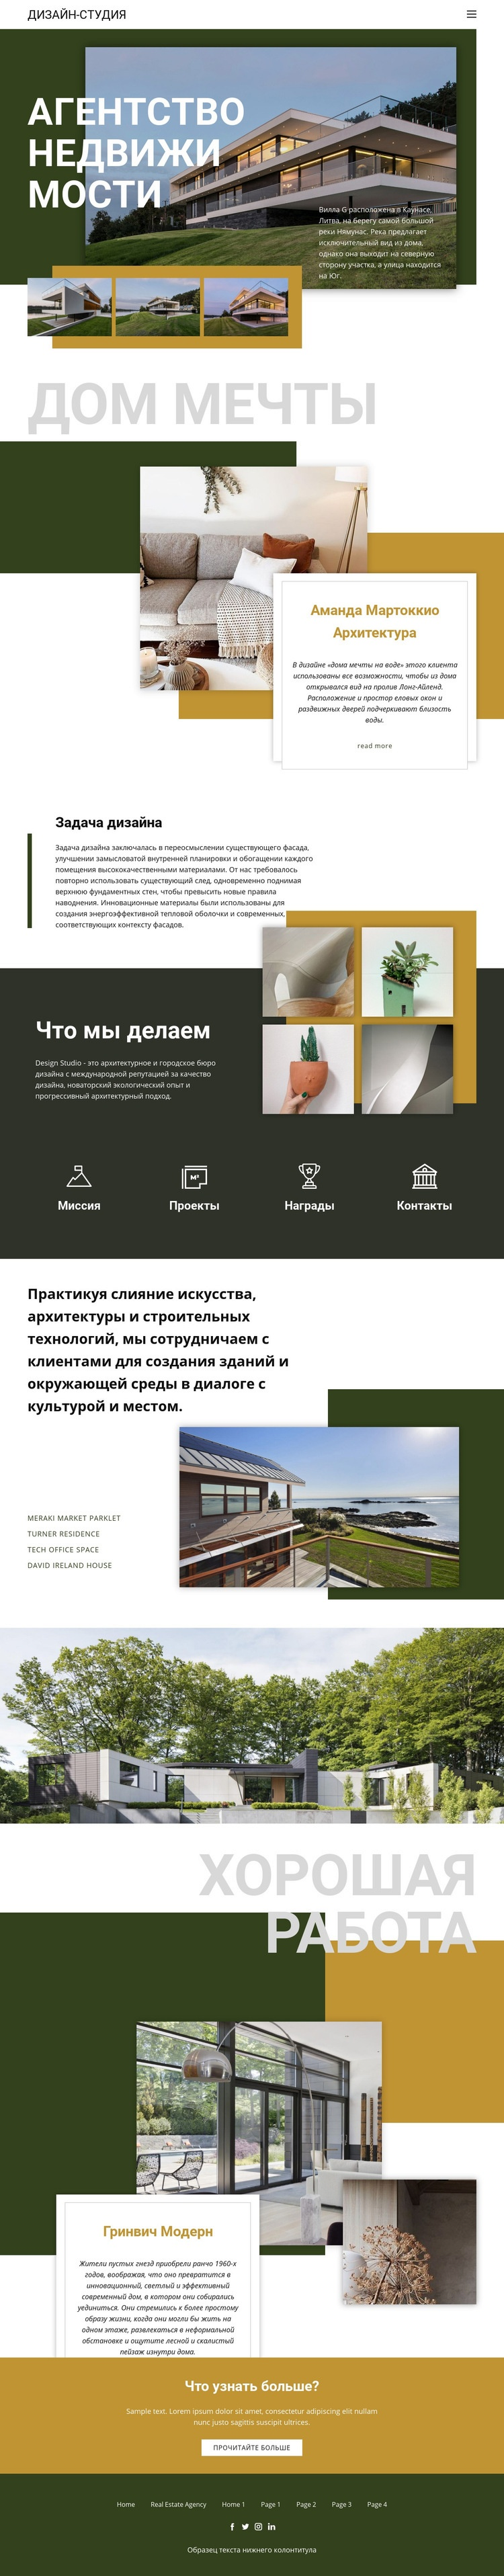 Агентство недвижимости мечты WordPress тема